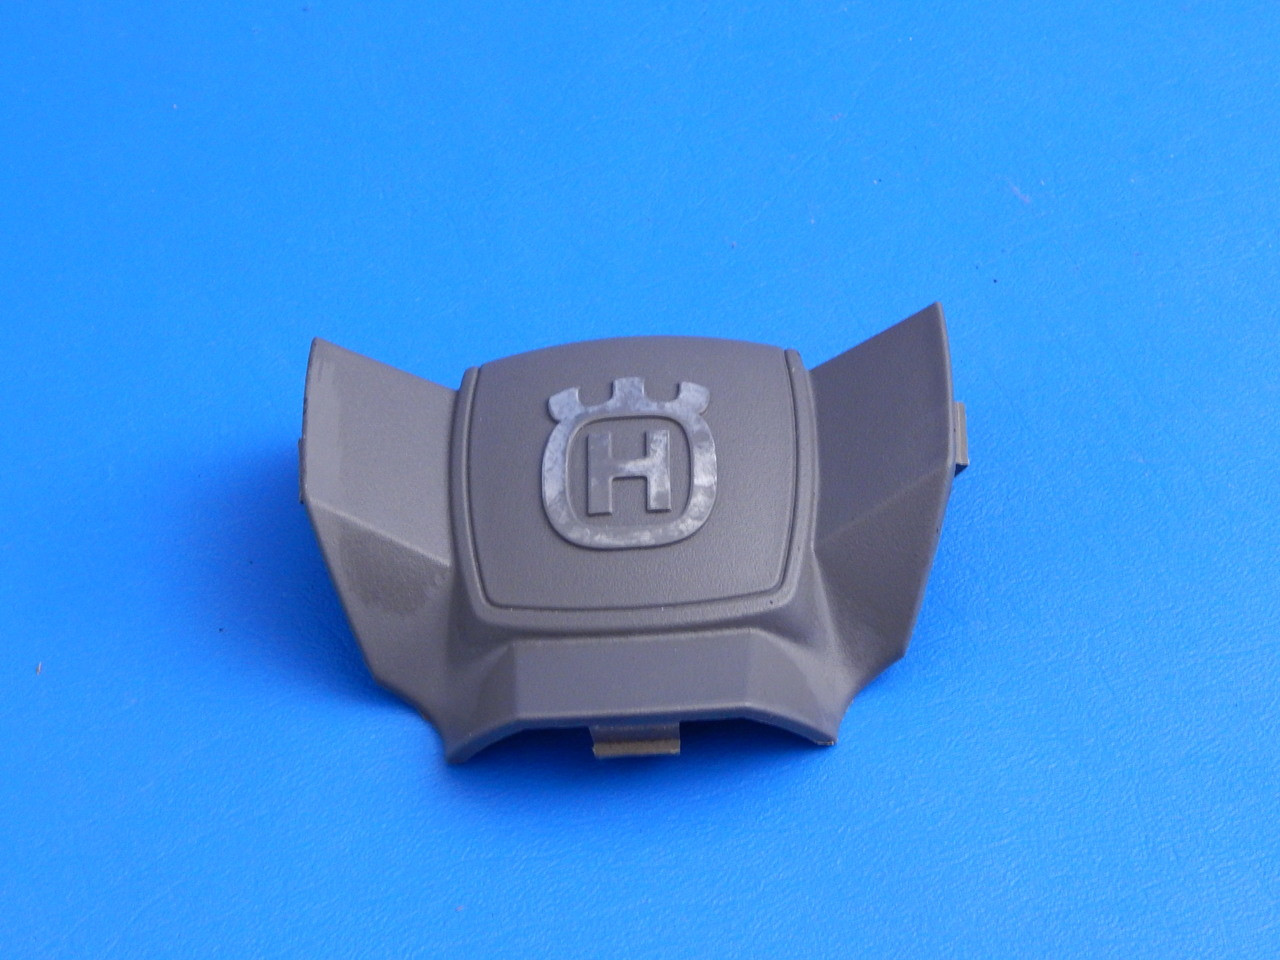 medium resolution of husqvarna yth2348 riding lawn mower steering wheel insert cap 532415987 ice cold beer appliance parts